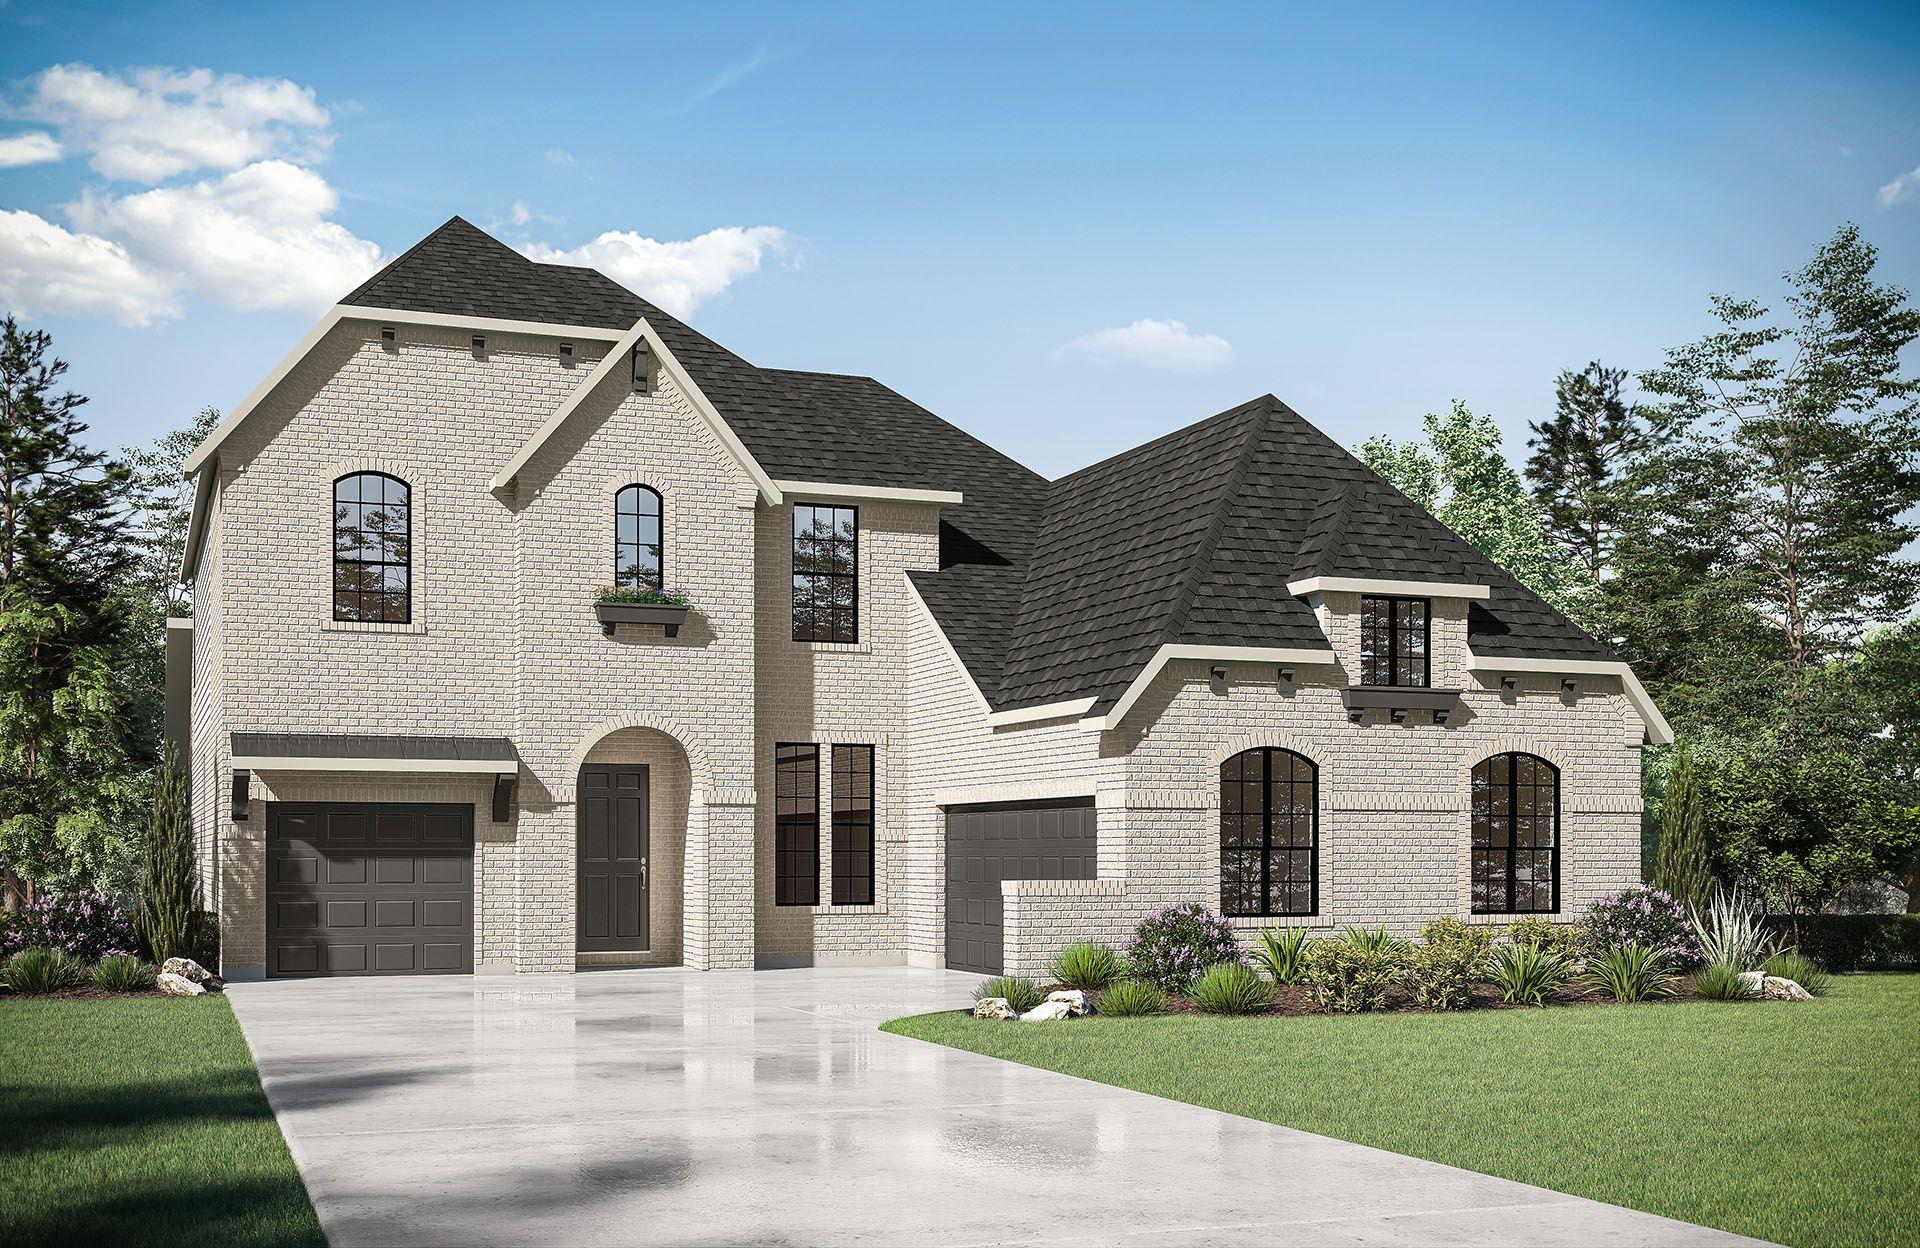 Single Family for Active at Deerfield J 525 Bennington Lane Keller, Texas 76248 United States